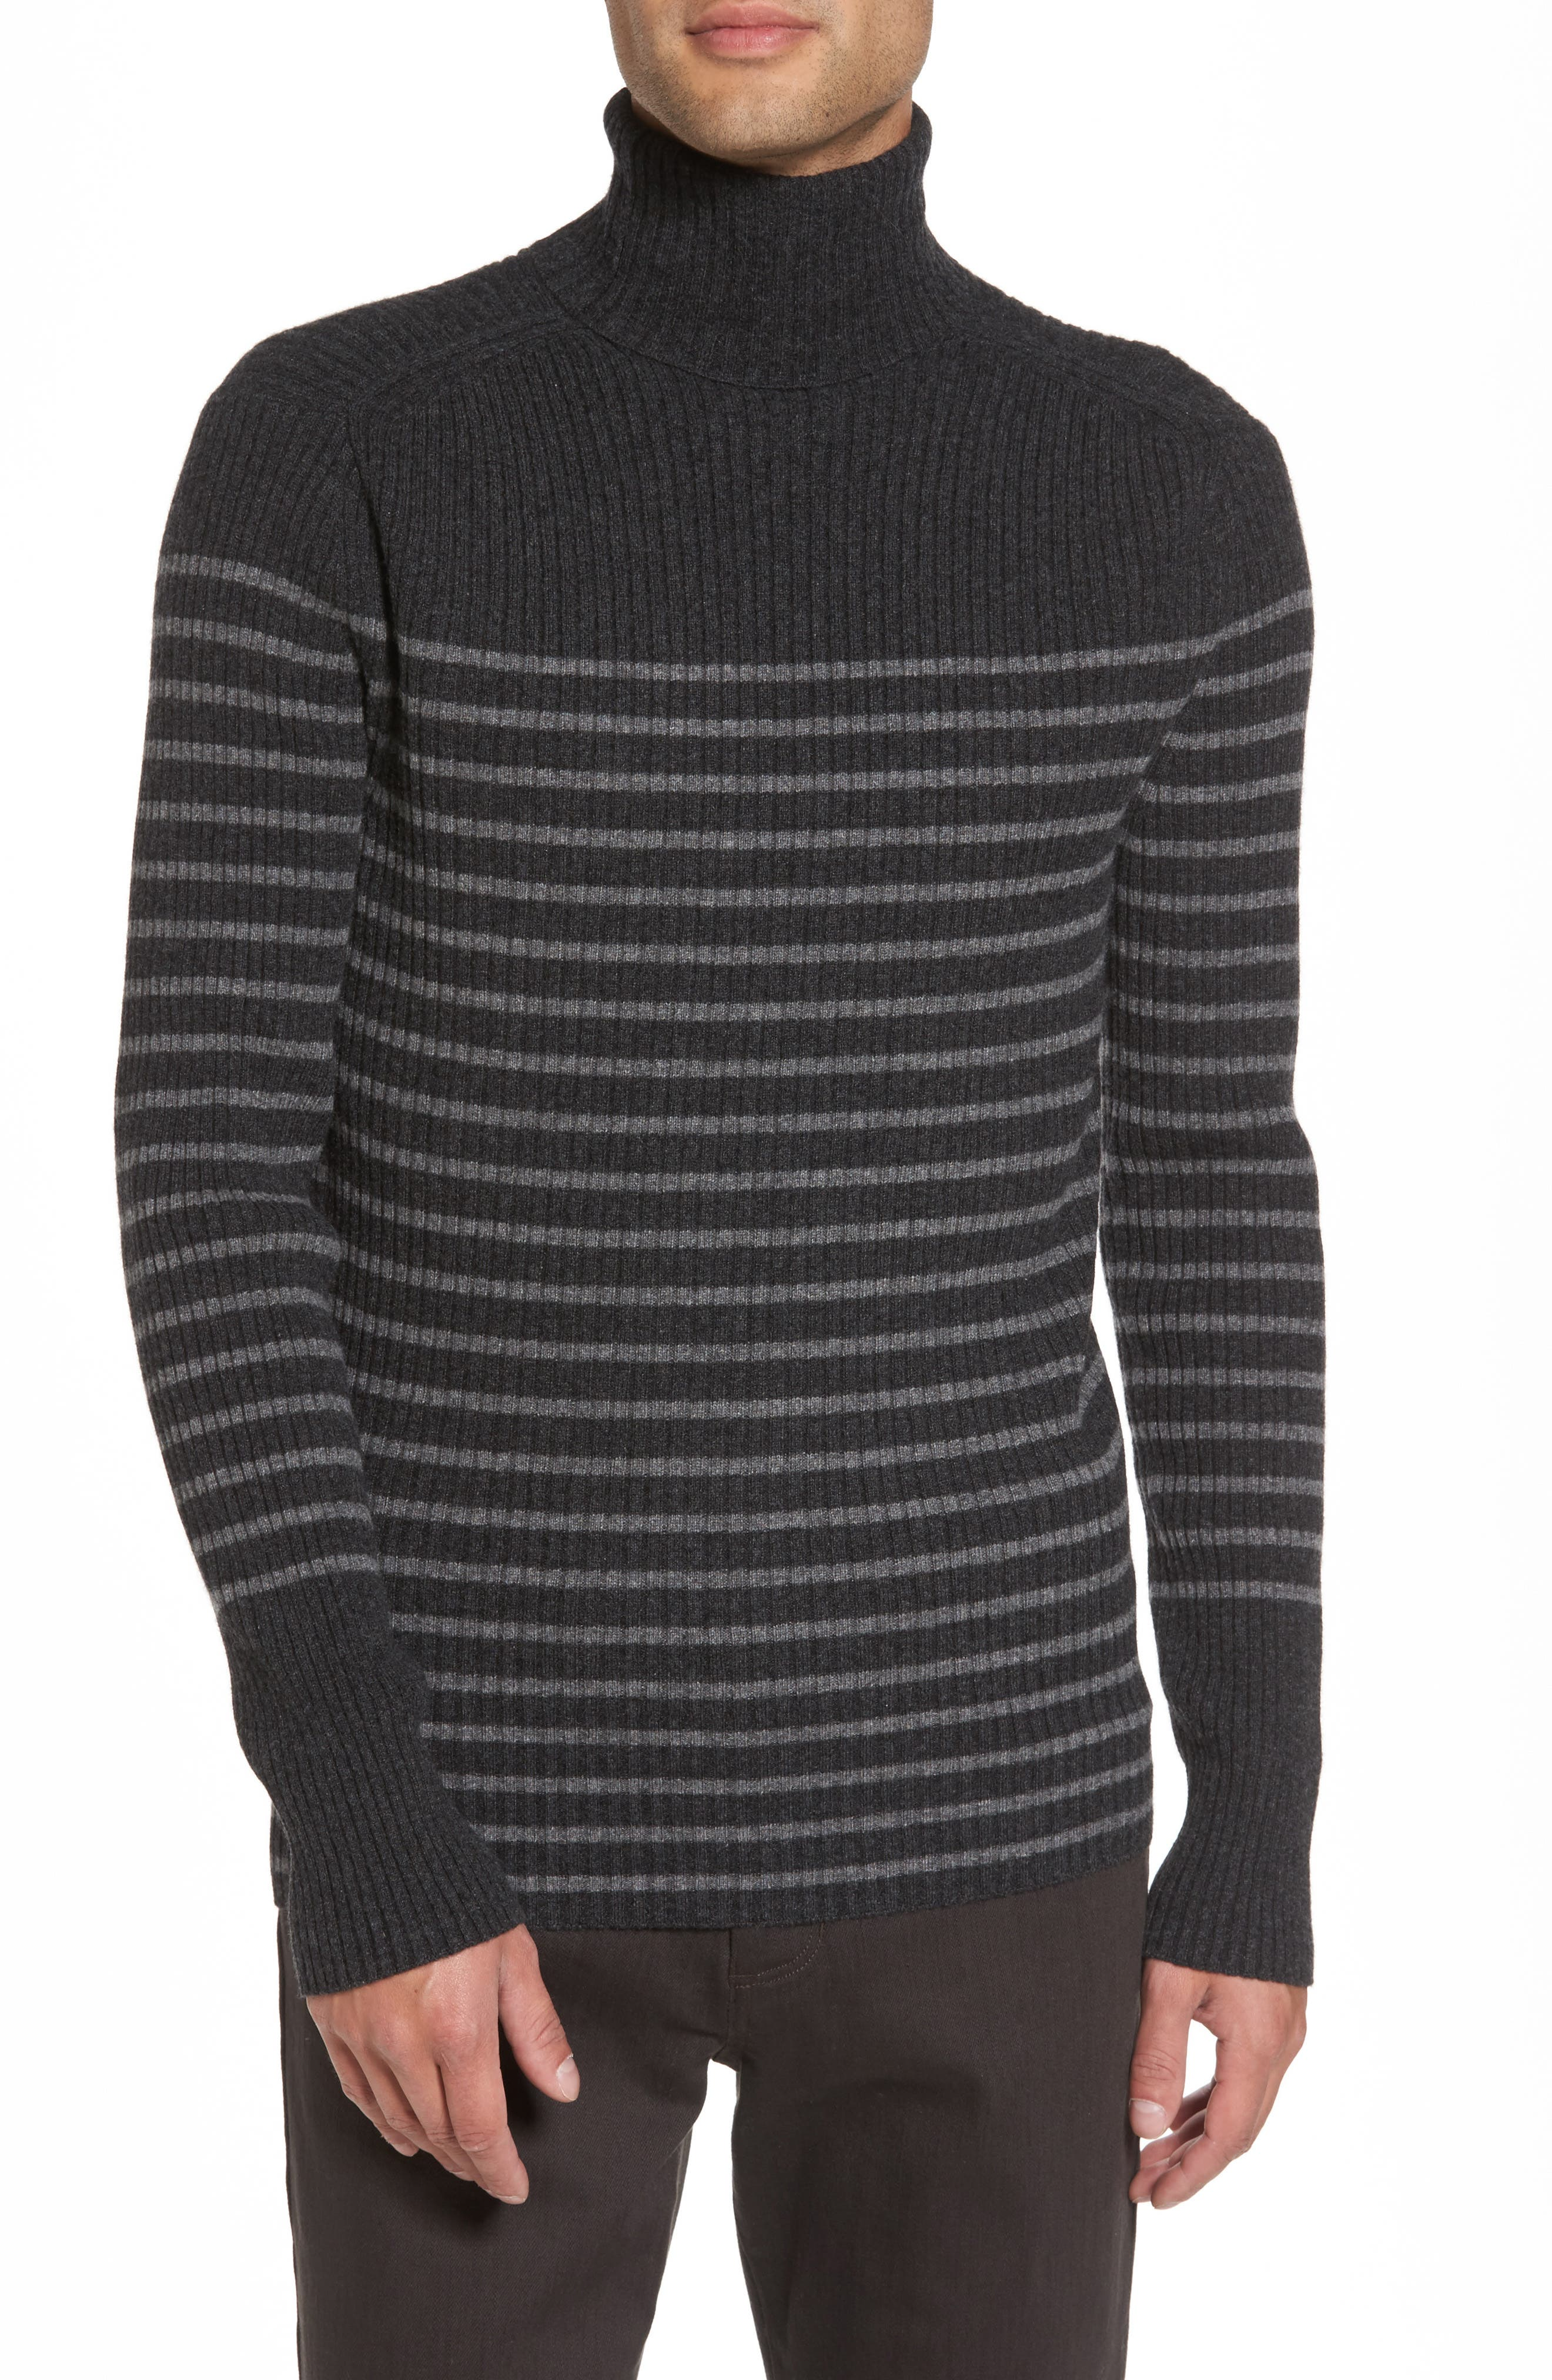 Main Image - Vince Regular Fit Breton Stripe Cashmere Turtleneck Sweater